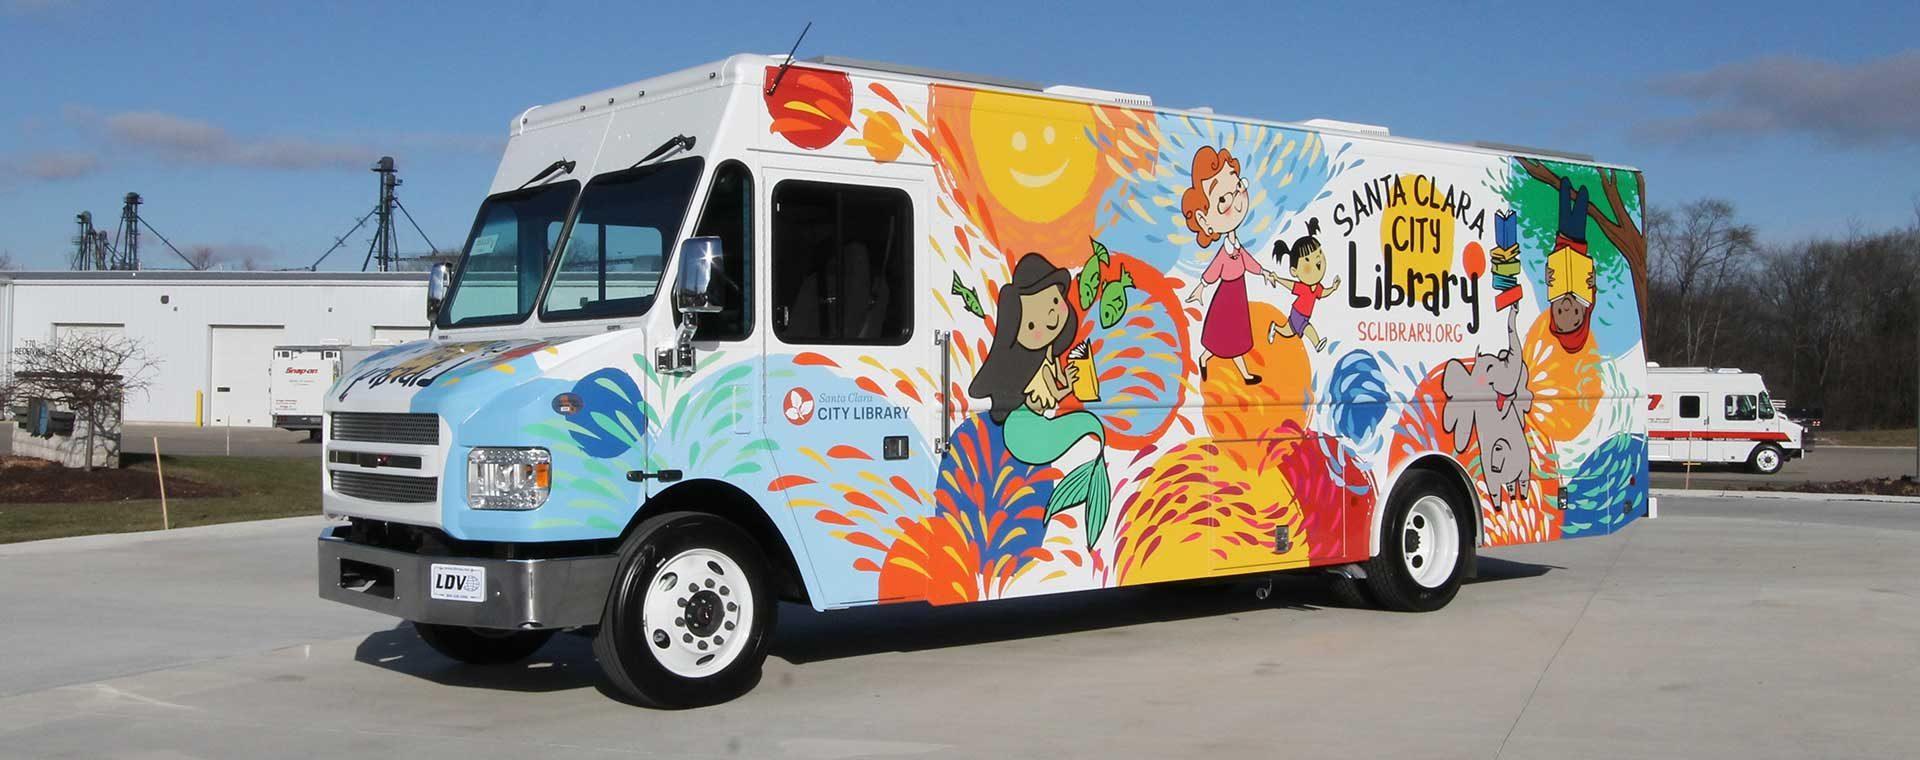 Santa Clara Bookmobile exterior